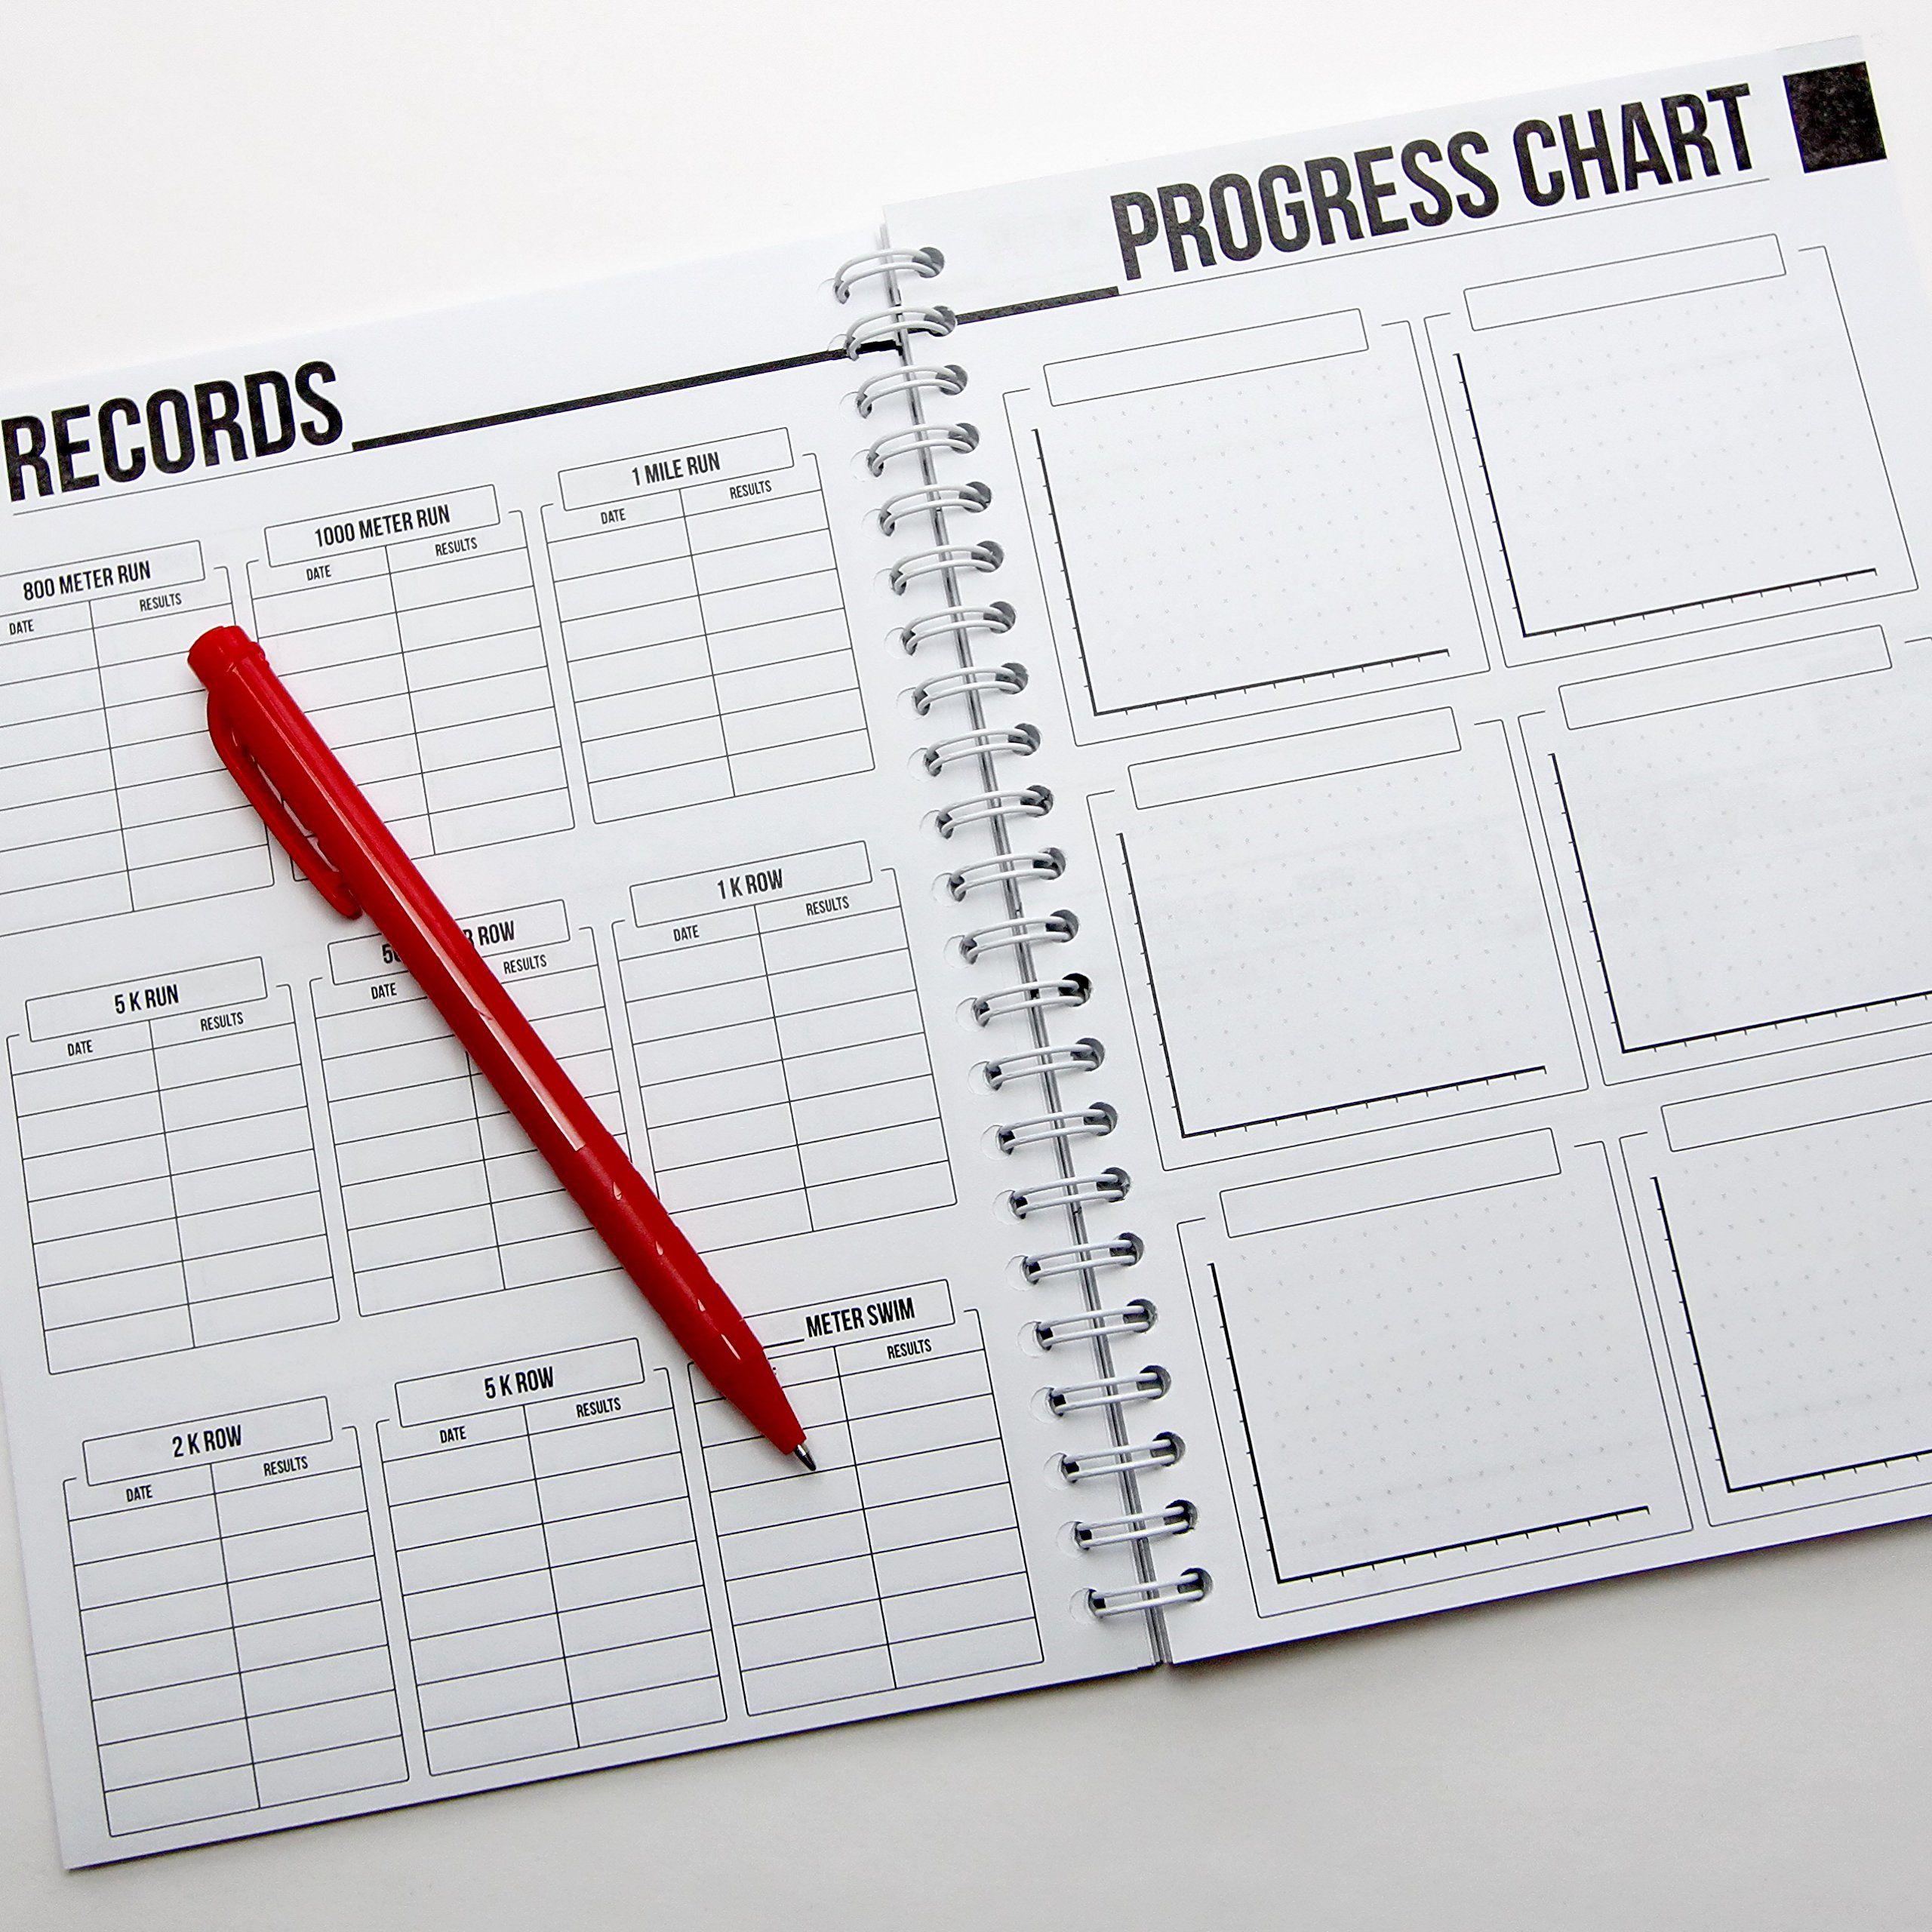 Wodbook Training Journal By Profit Crossfit Wod Log Book Workout Planner Cross Training Tracking Diary Crossfi Workout Log Book Fitness Planner Workout Log